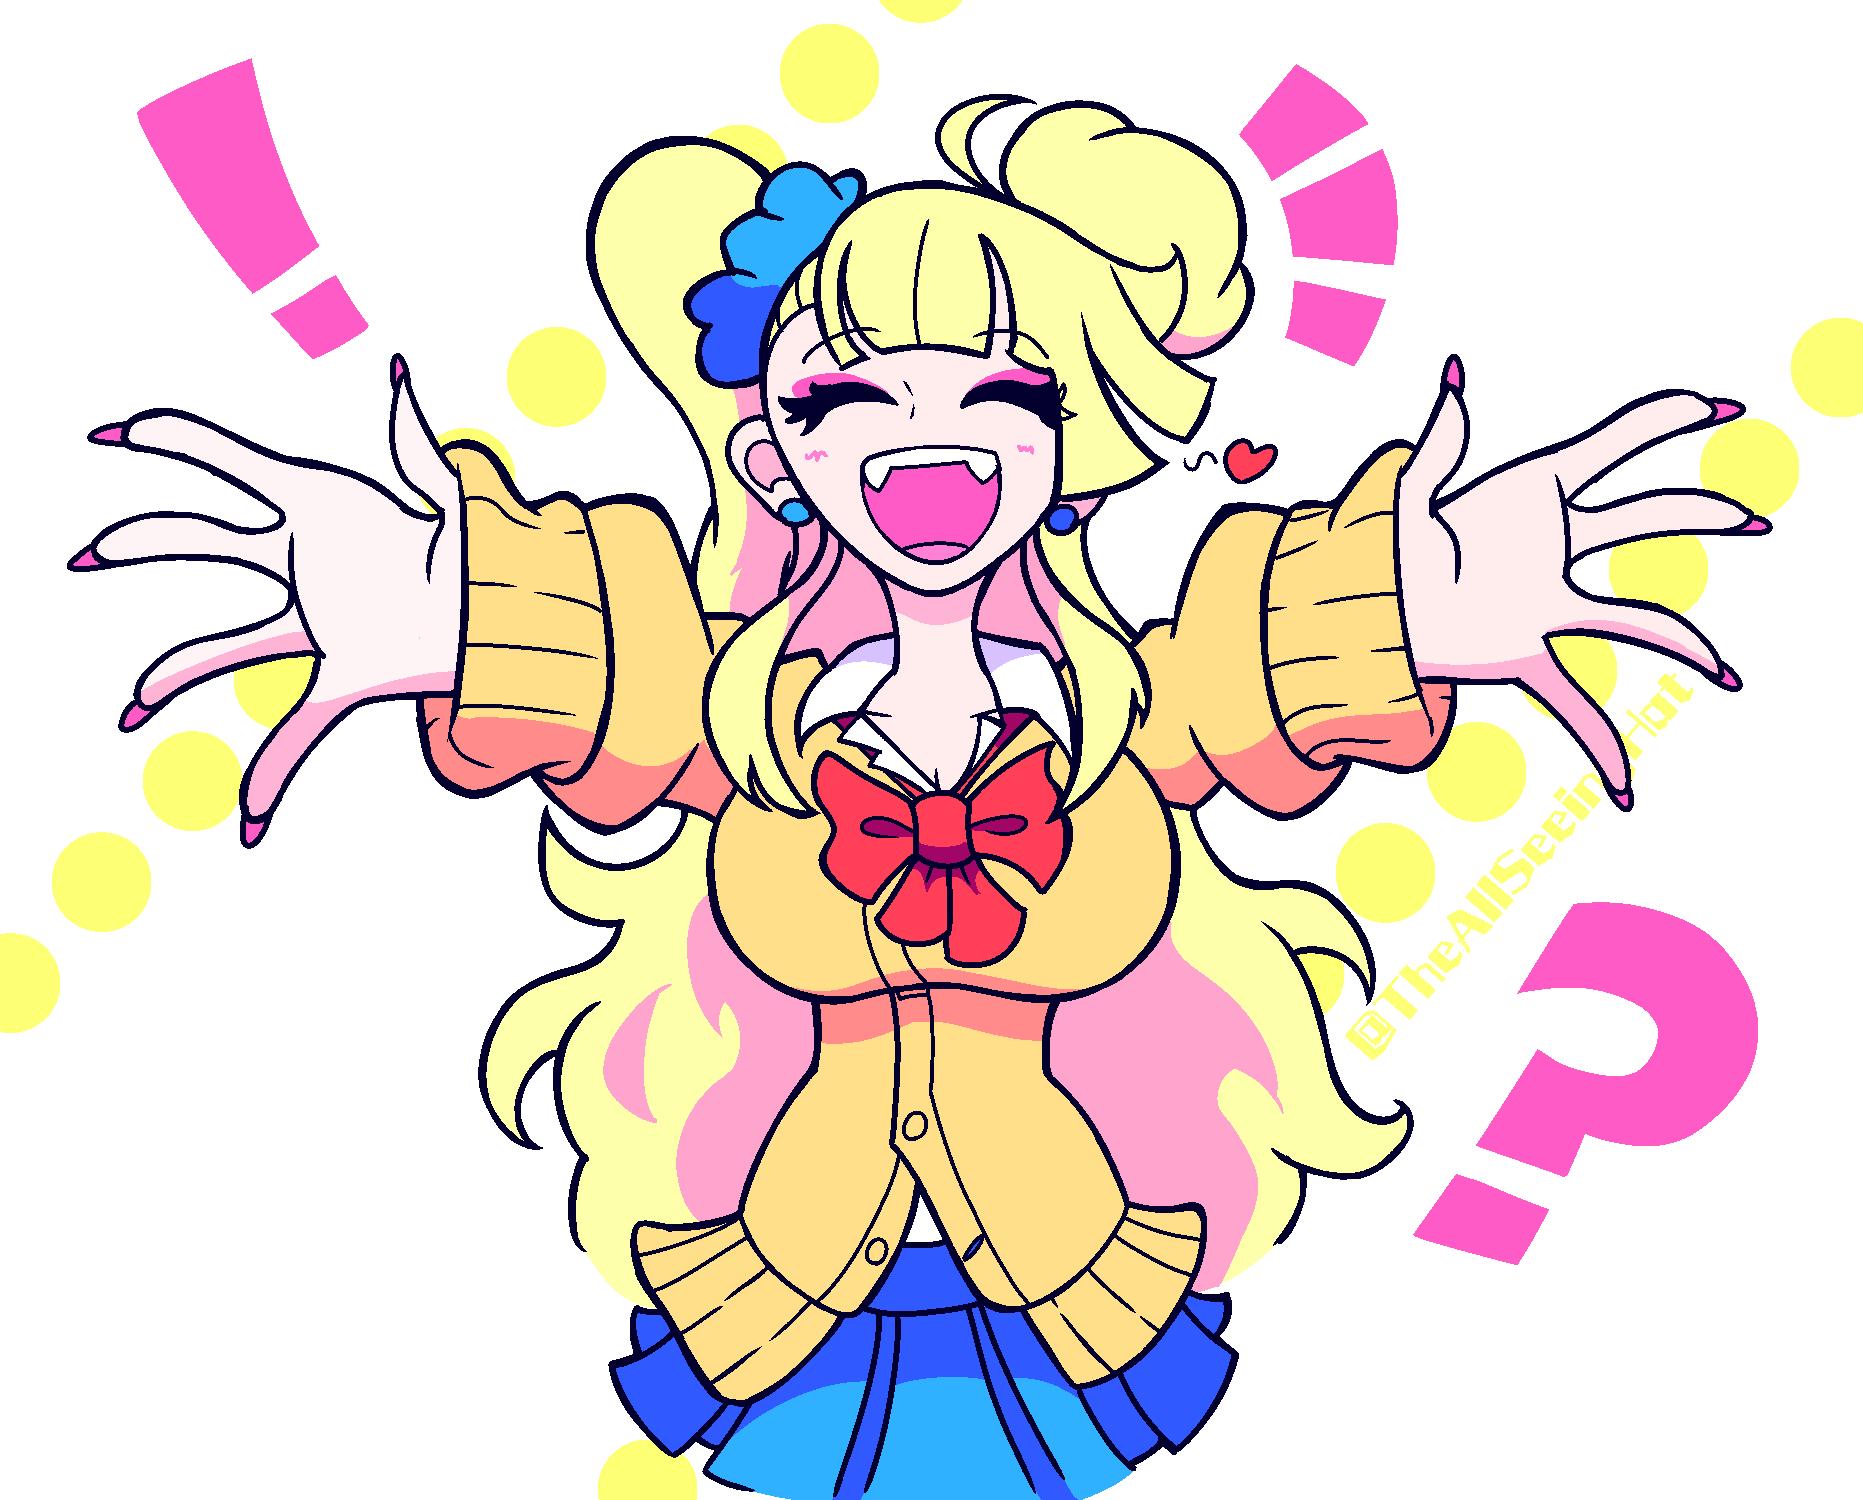 Galko-chan!